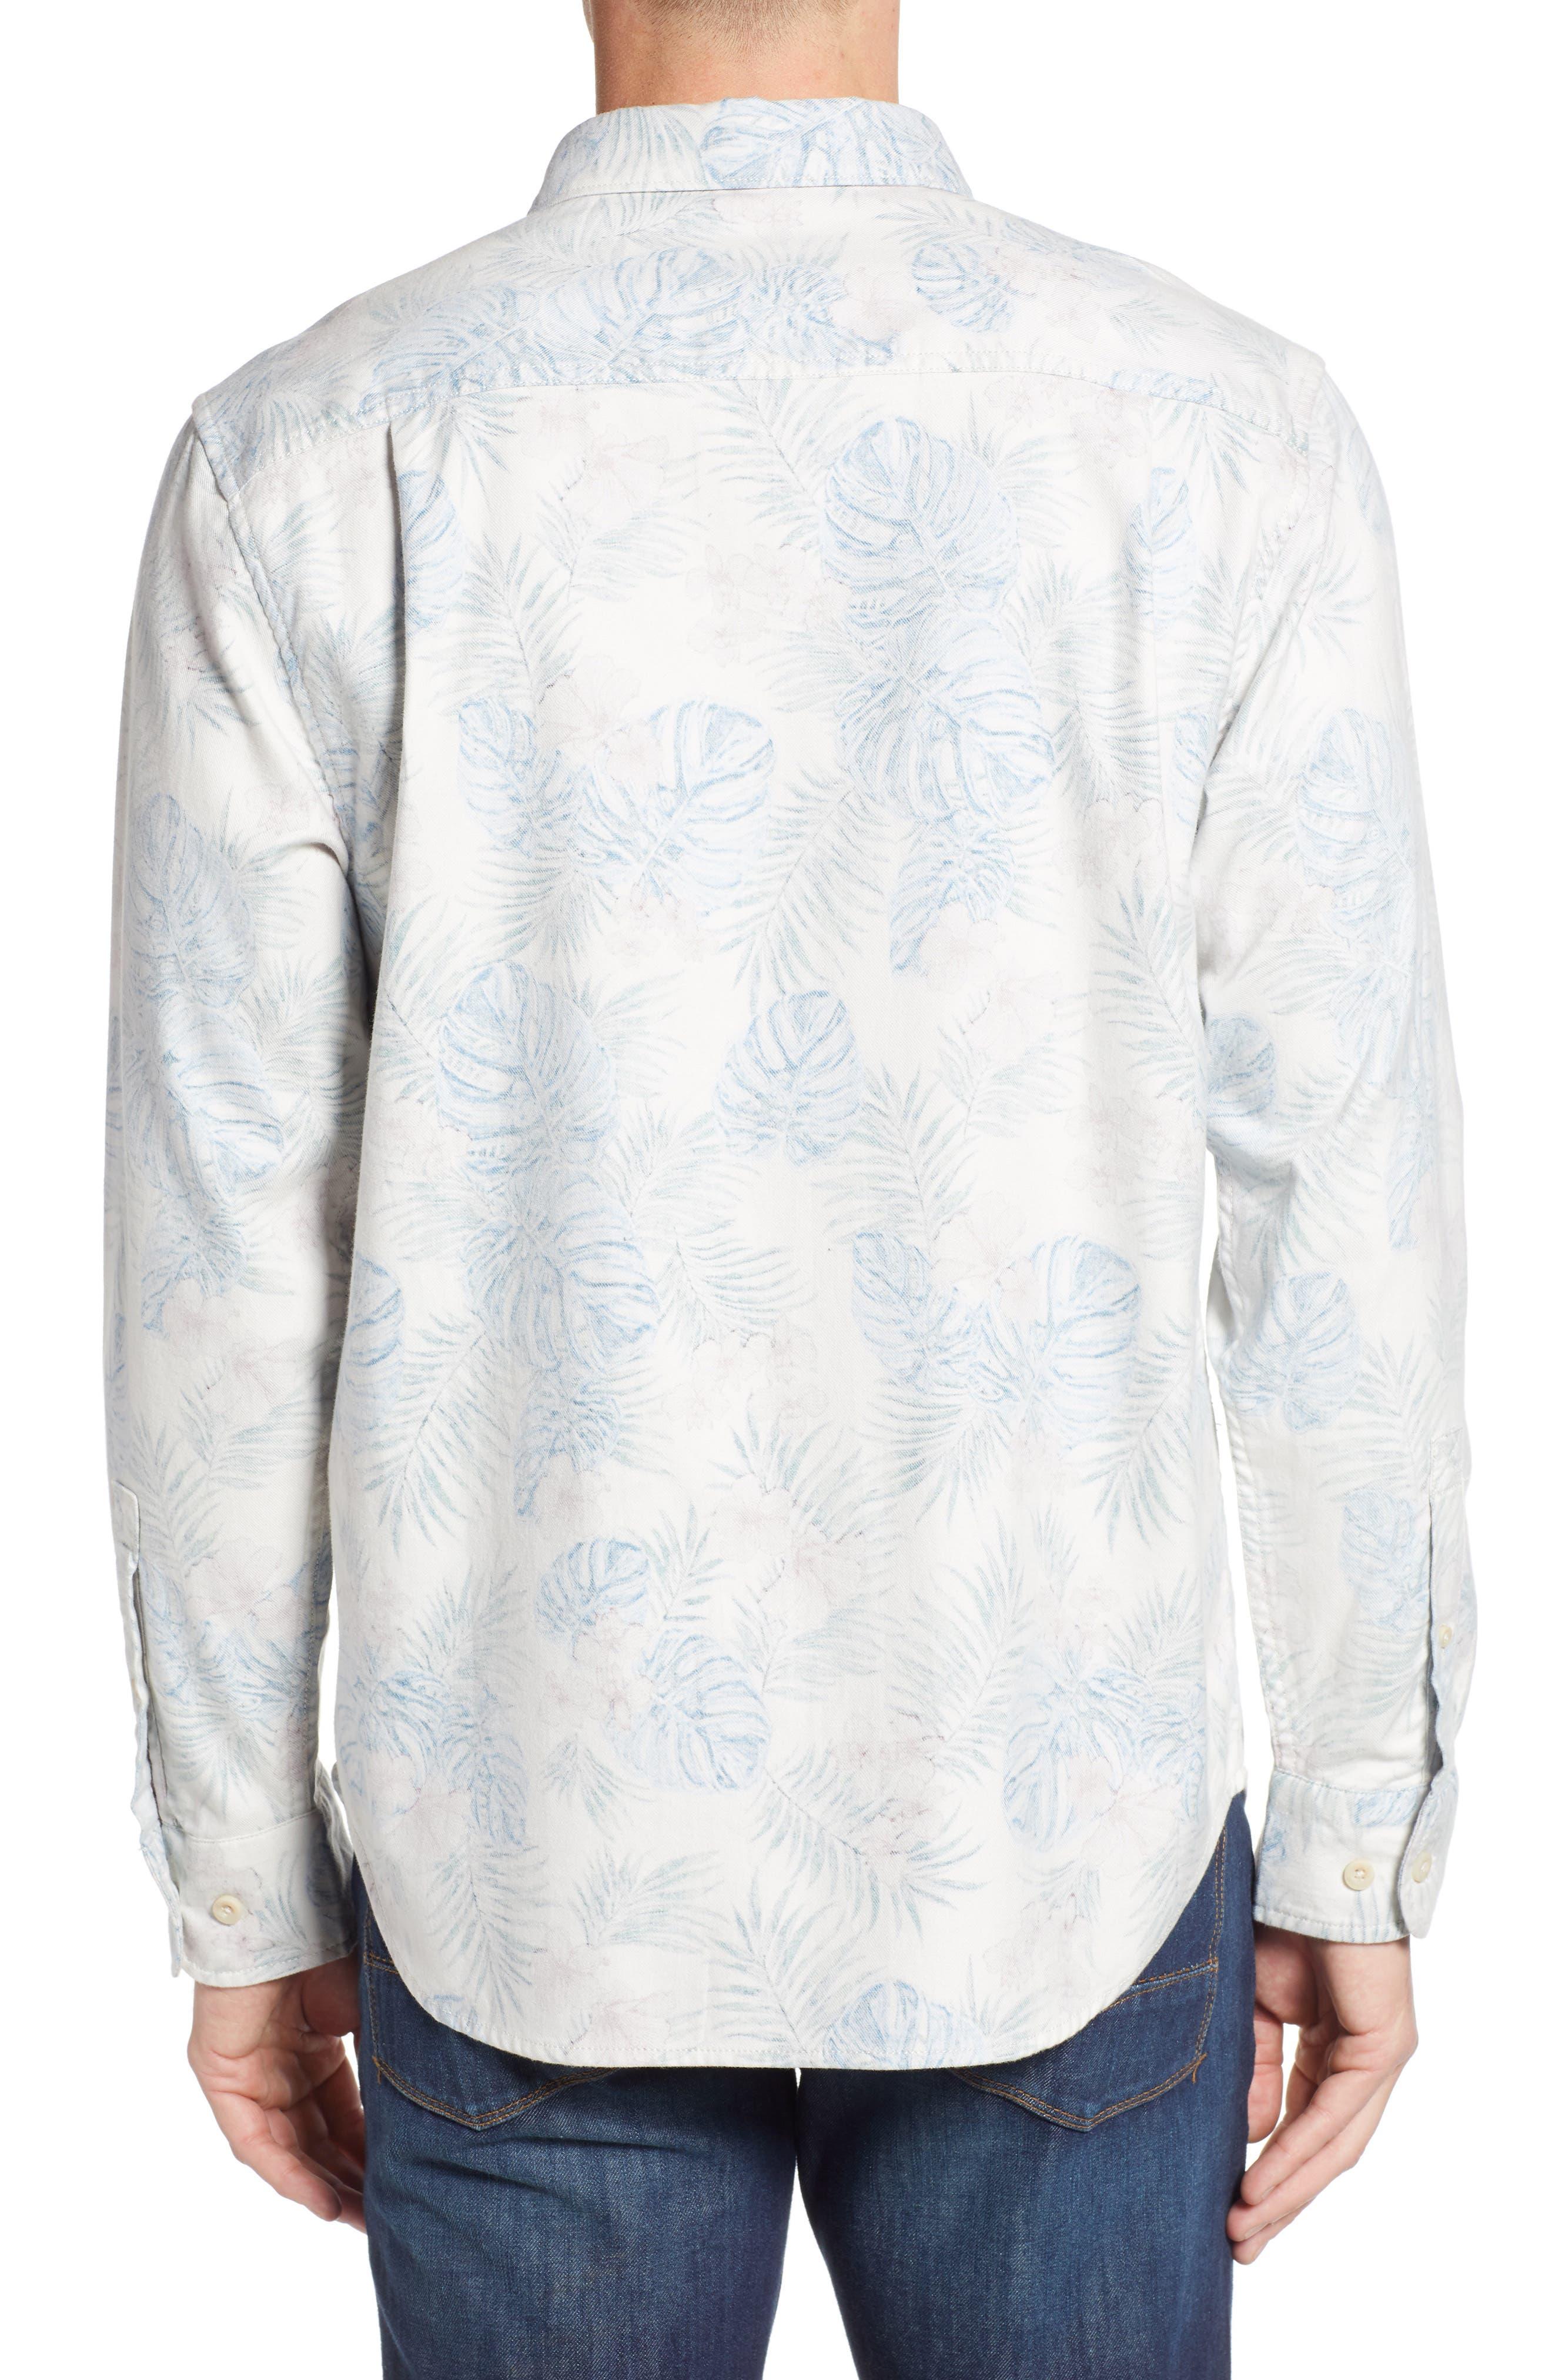 TOMMY BAHAMA, Beach Palms Long Sleeve Flannel Sport Shirt, Alternate thumbnail 2, color, 200